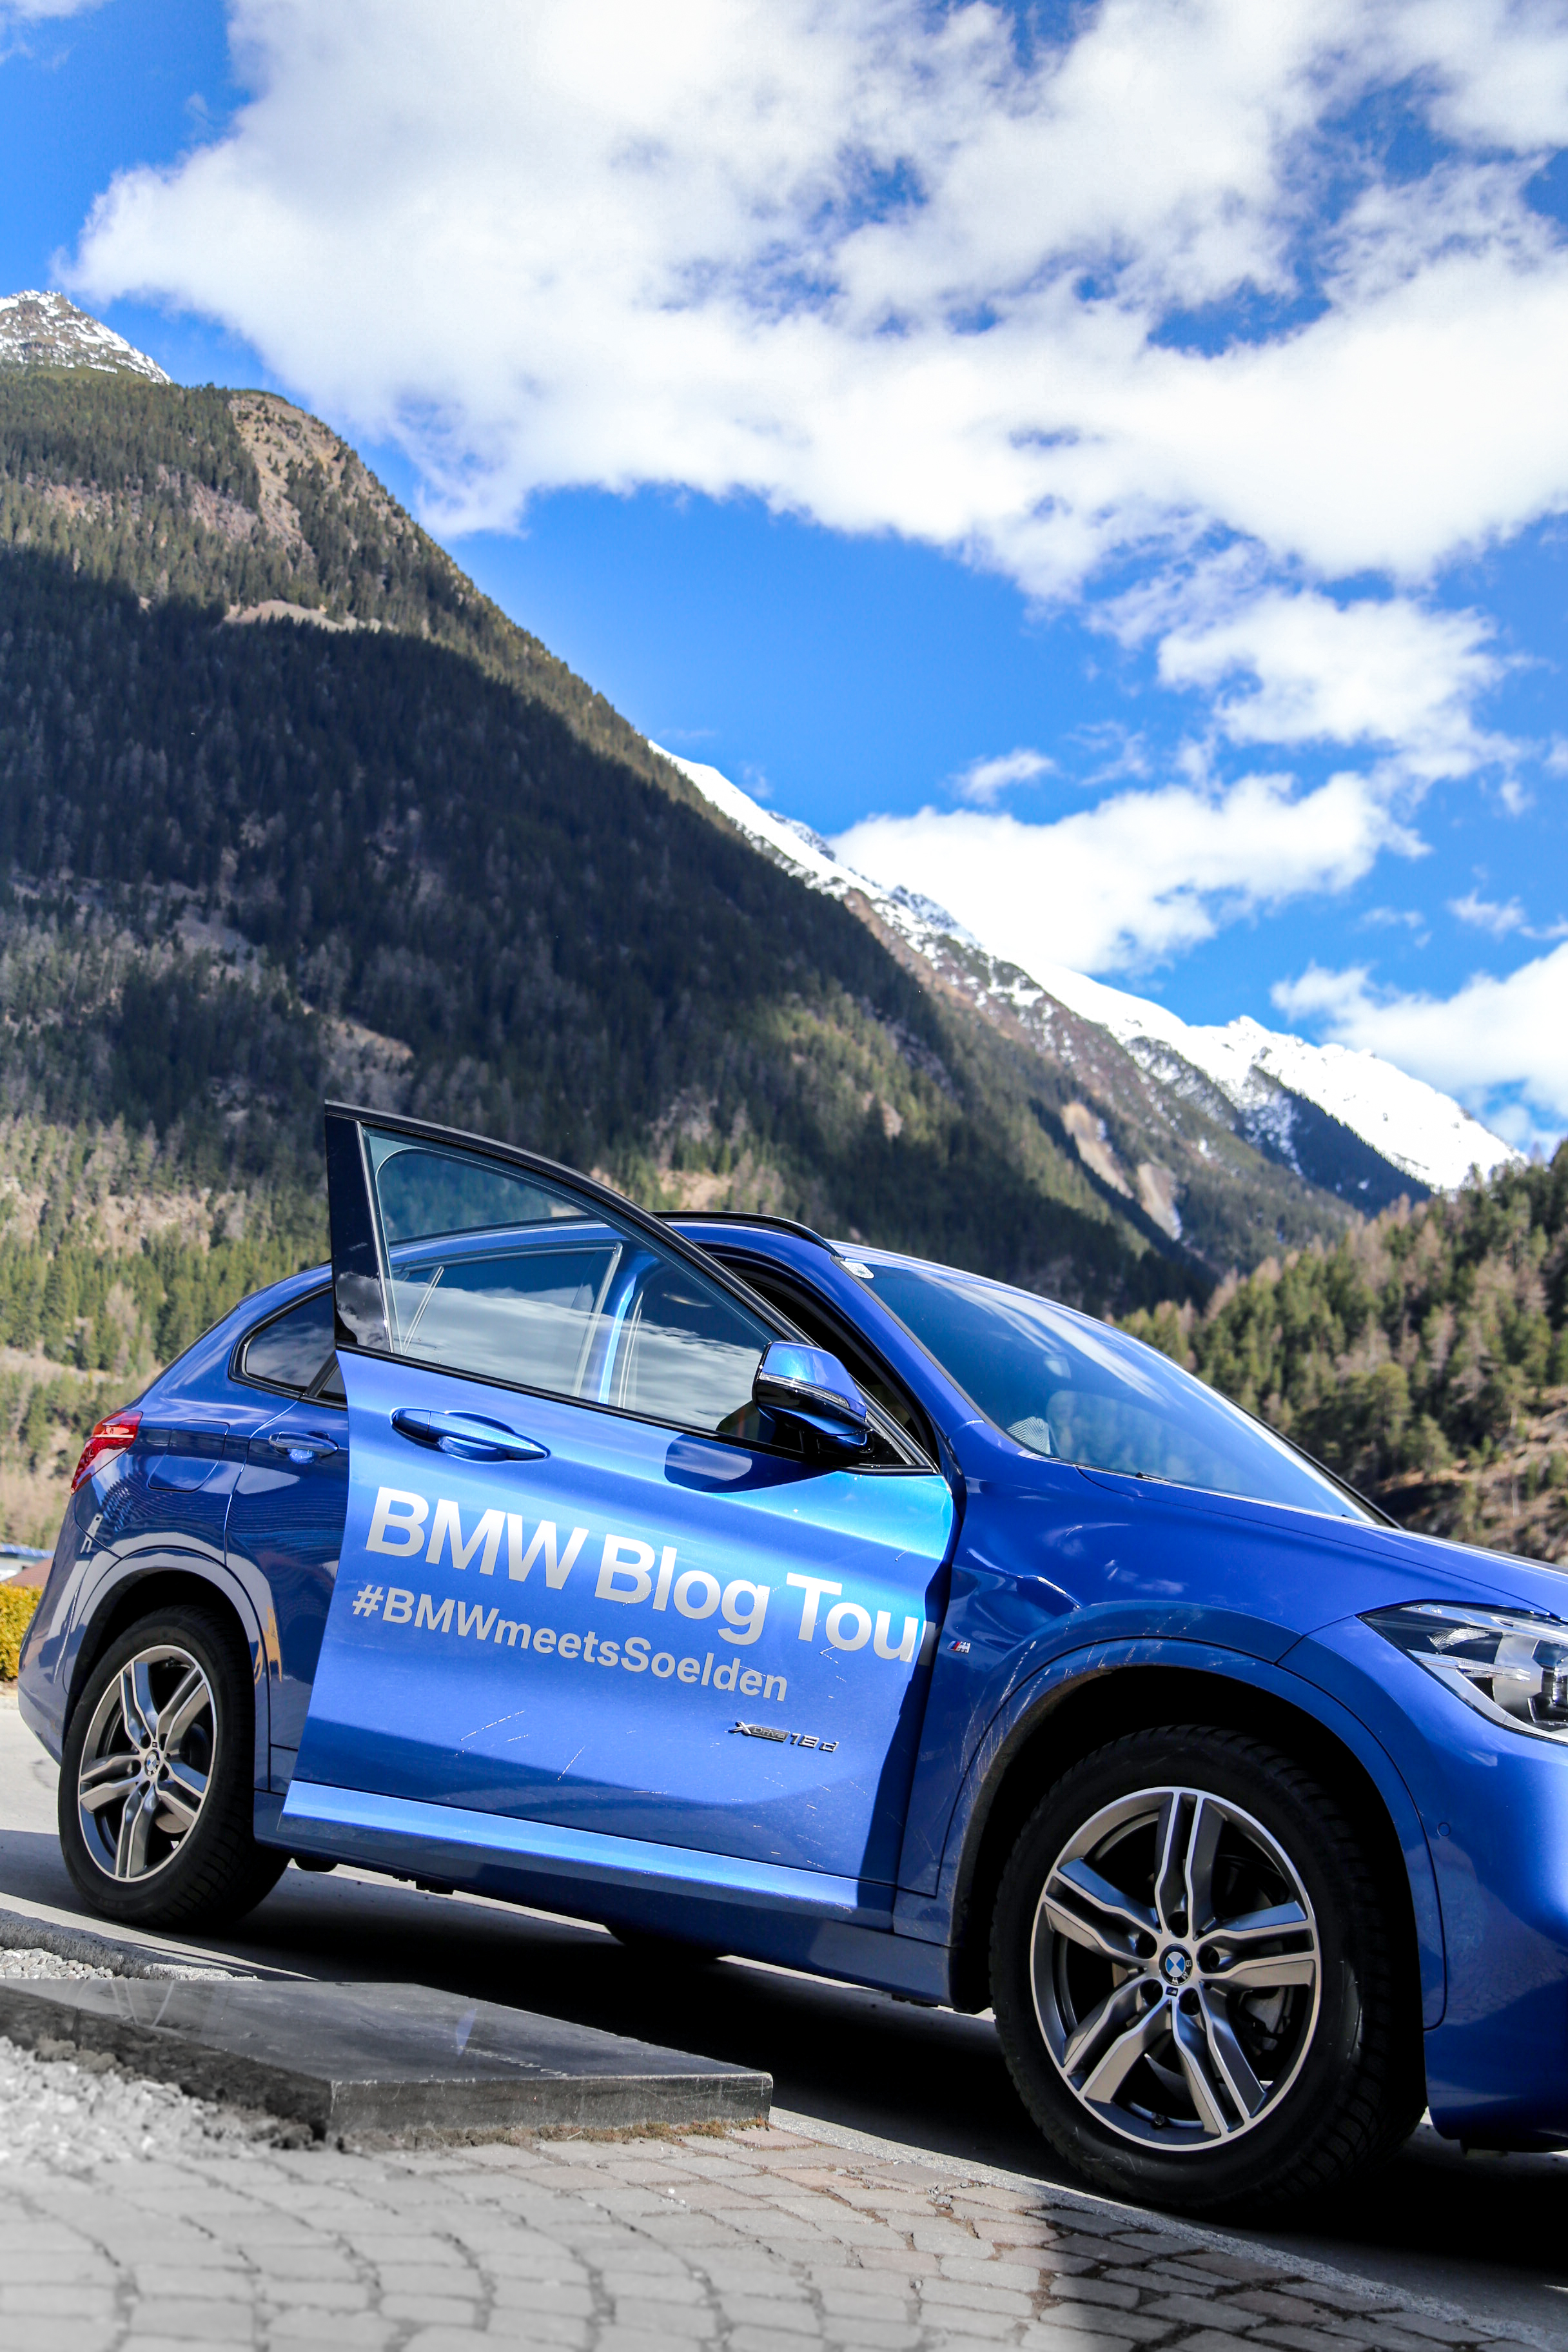 Travel Diary der BMW Blog Tour mit dem BMW X1 Blogger Alpen Ötztal Berge Mountains Wellness Hotel Längenfeld AquaDome Sauna Jenni PepperAndGold Reise Kurzurlaub Ausflug